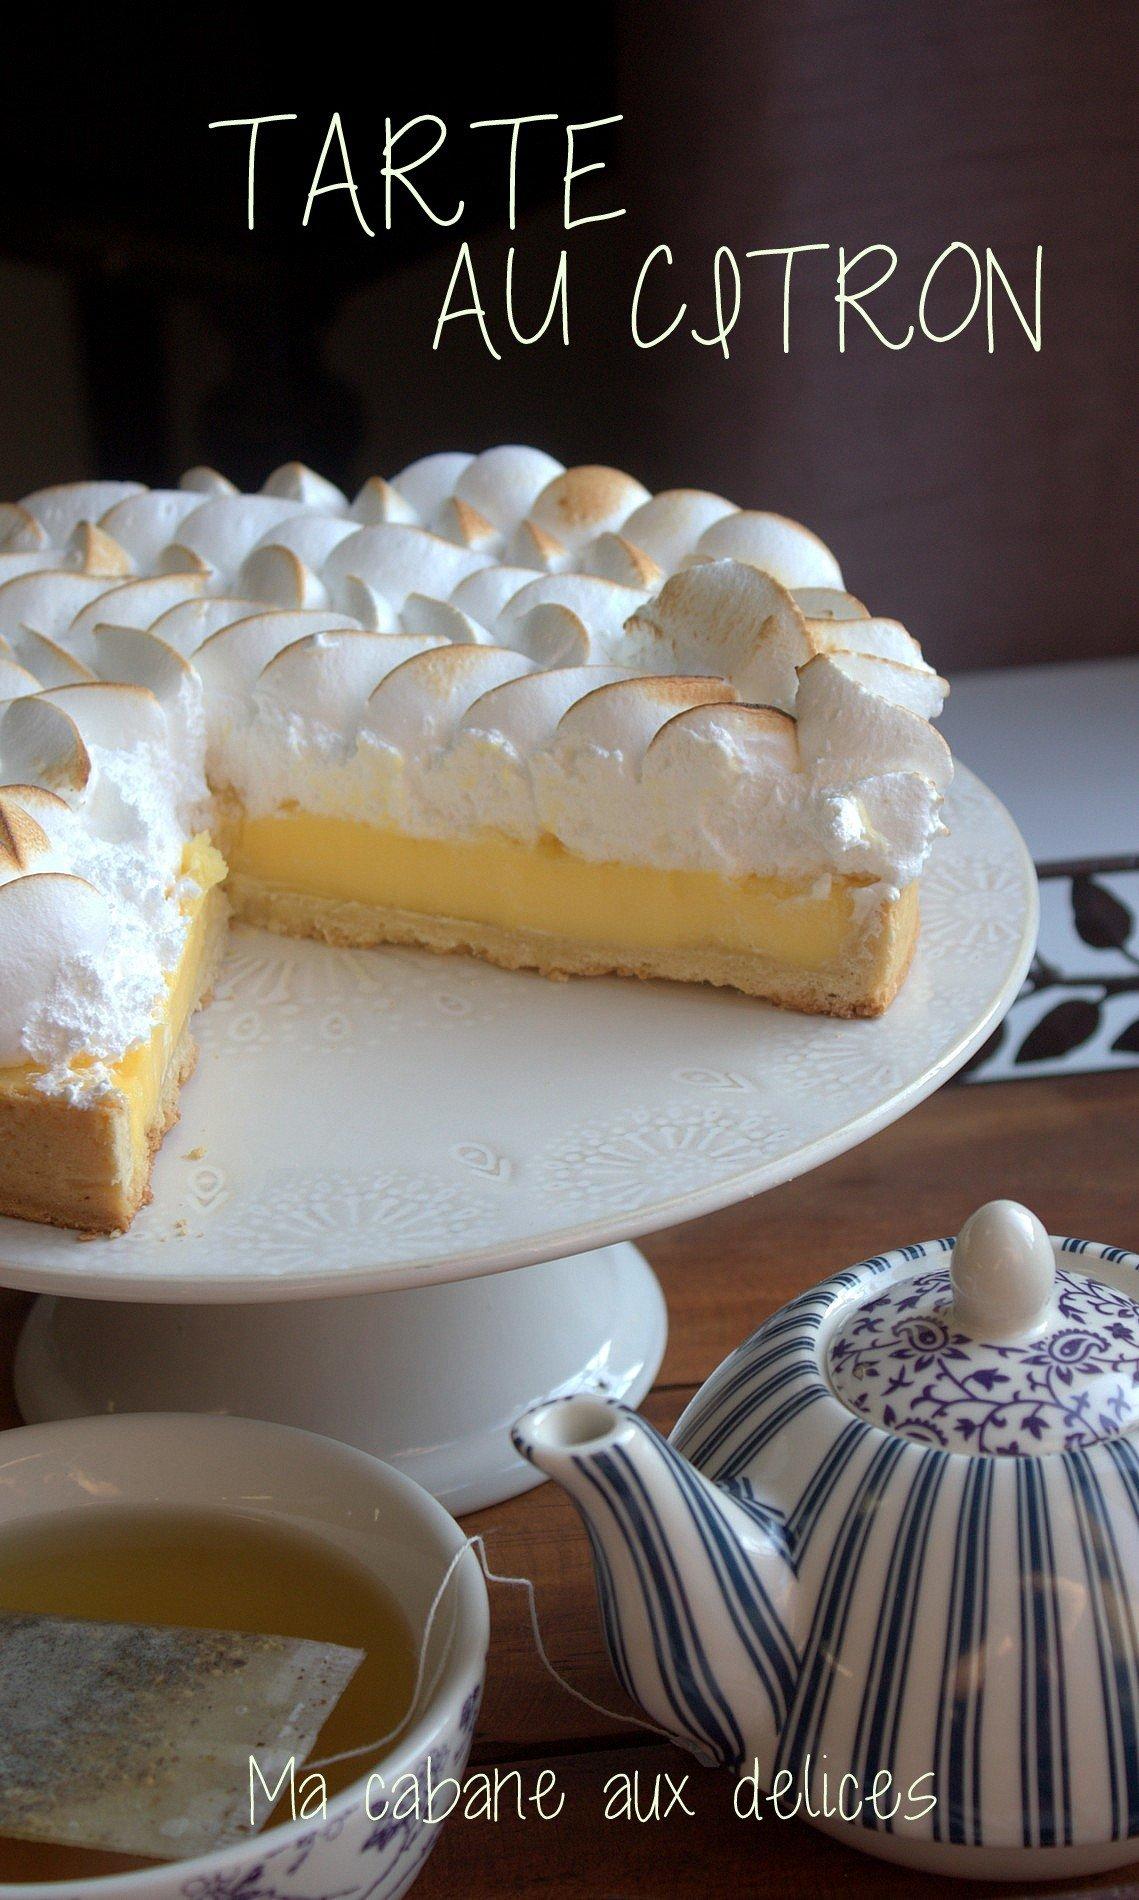 Vraie recette tarte citron meringu e recettes faciles recettes rapides de djouza - Recette tarte citron meringuee ...